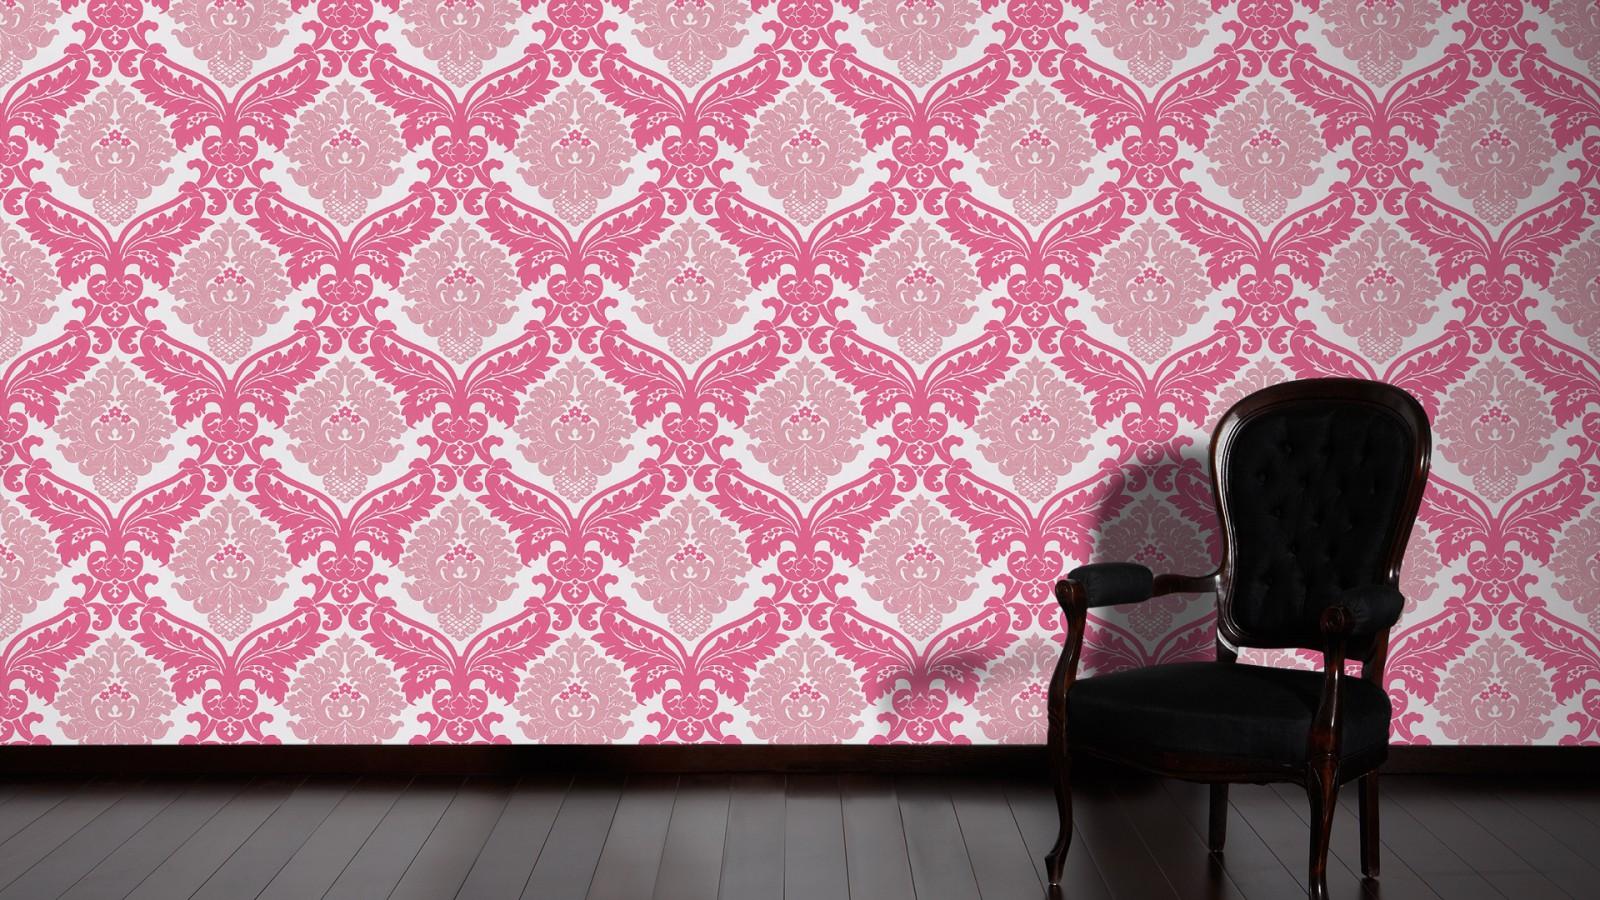 tapete bling bling barock glitzer pink wei 3139 35. Black Bedroom Furniture Sets. Home Design Ideas